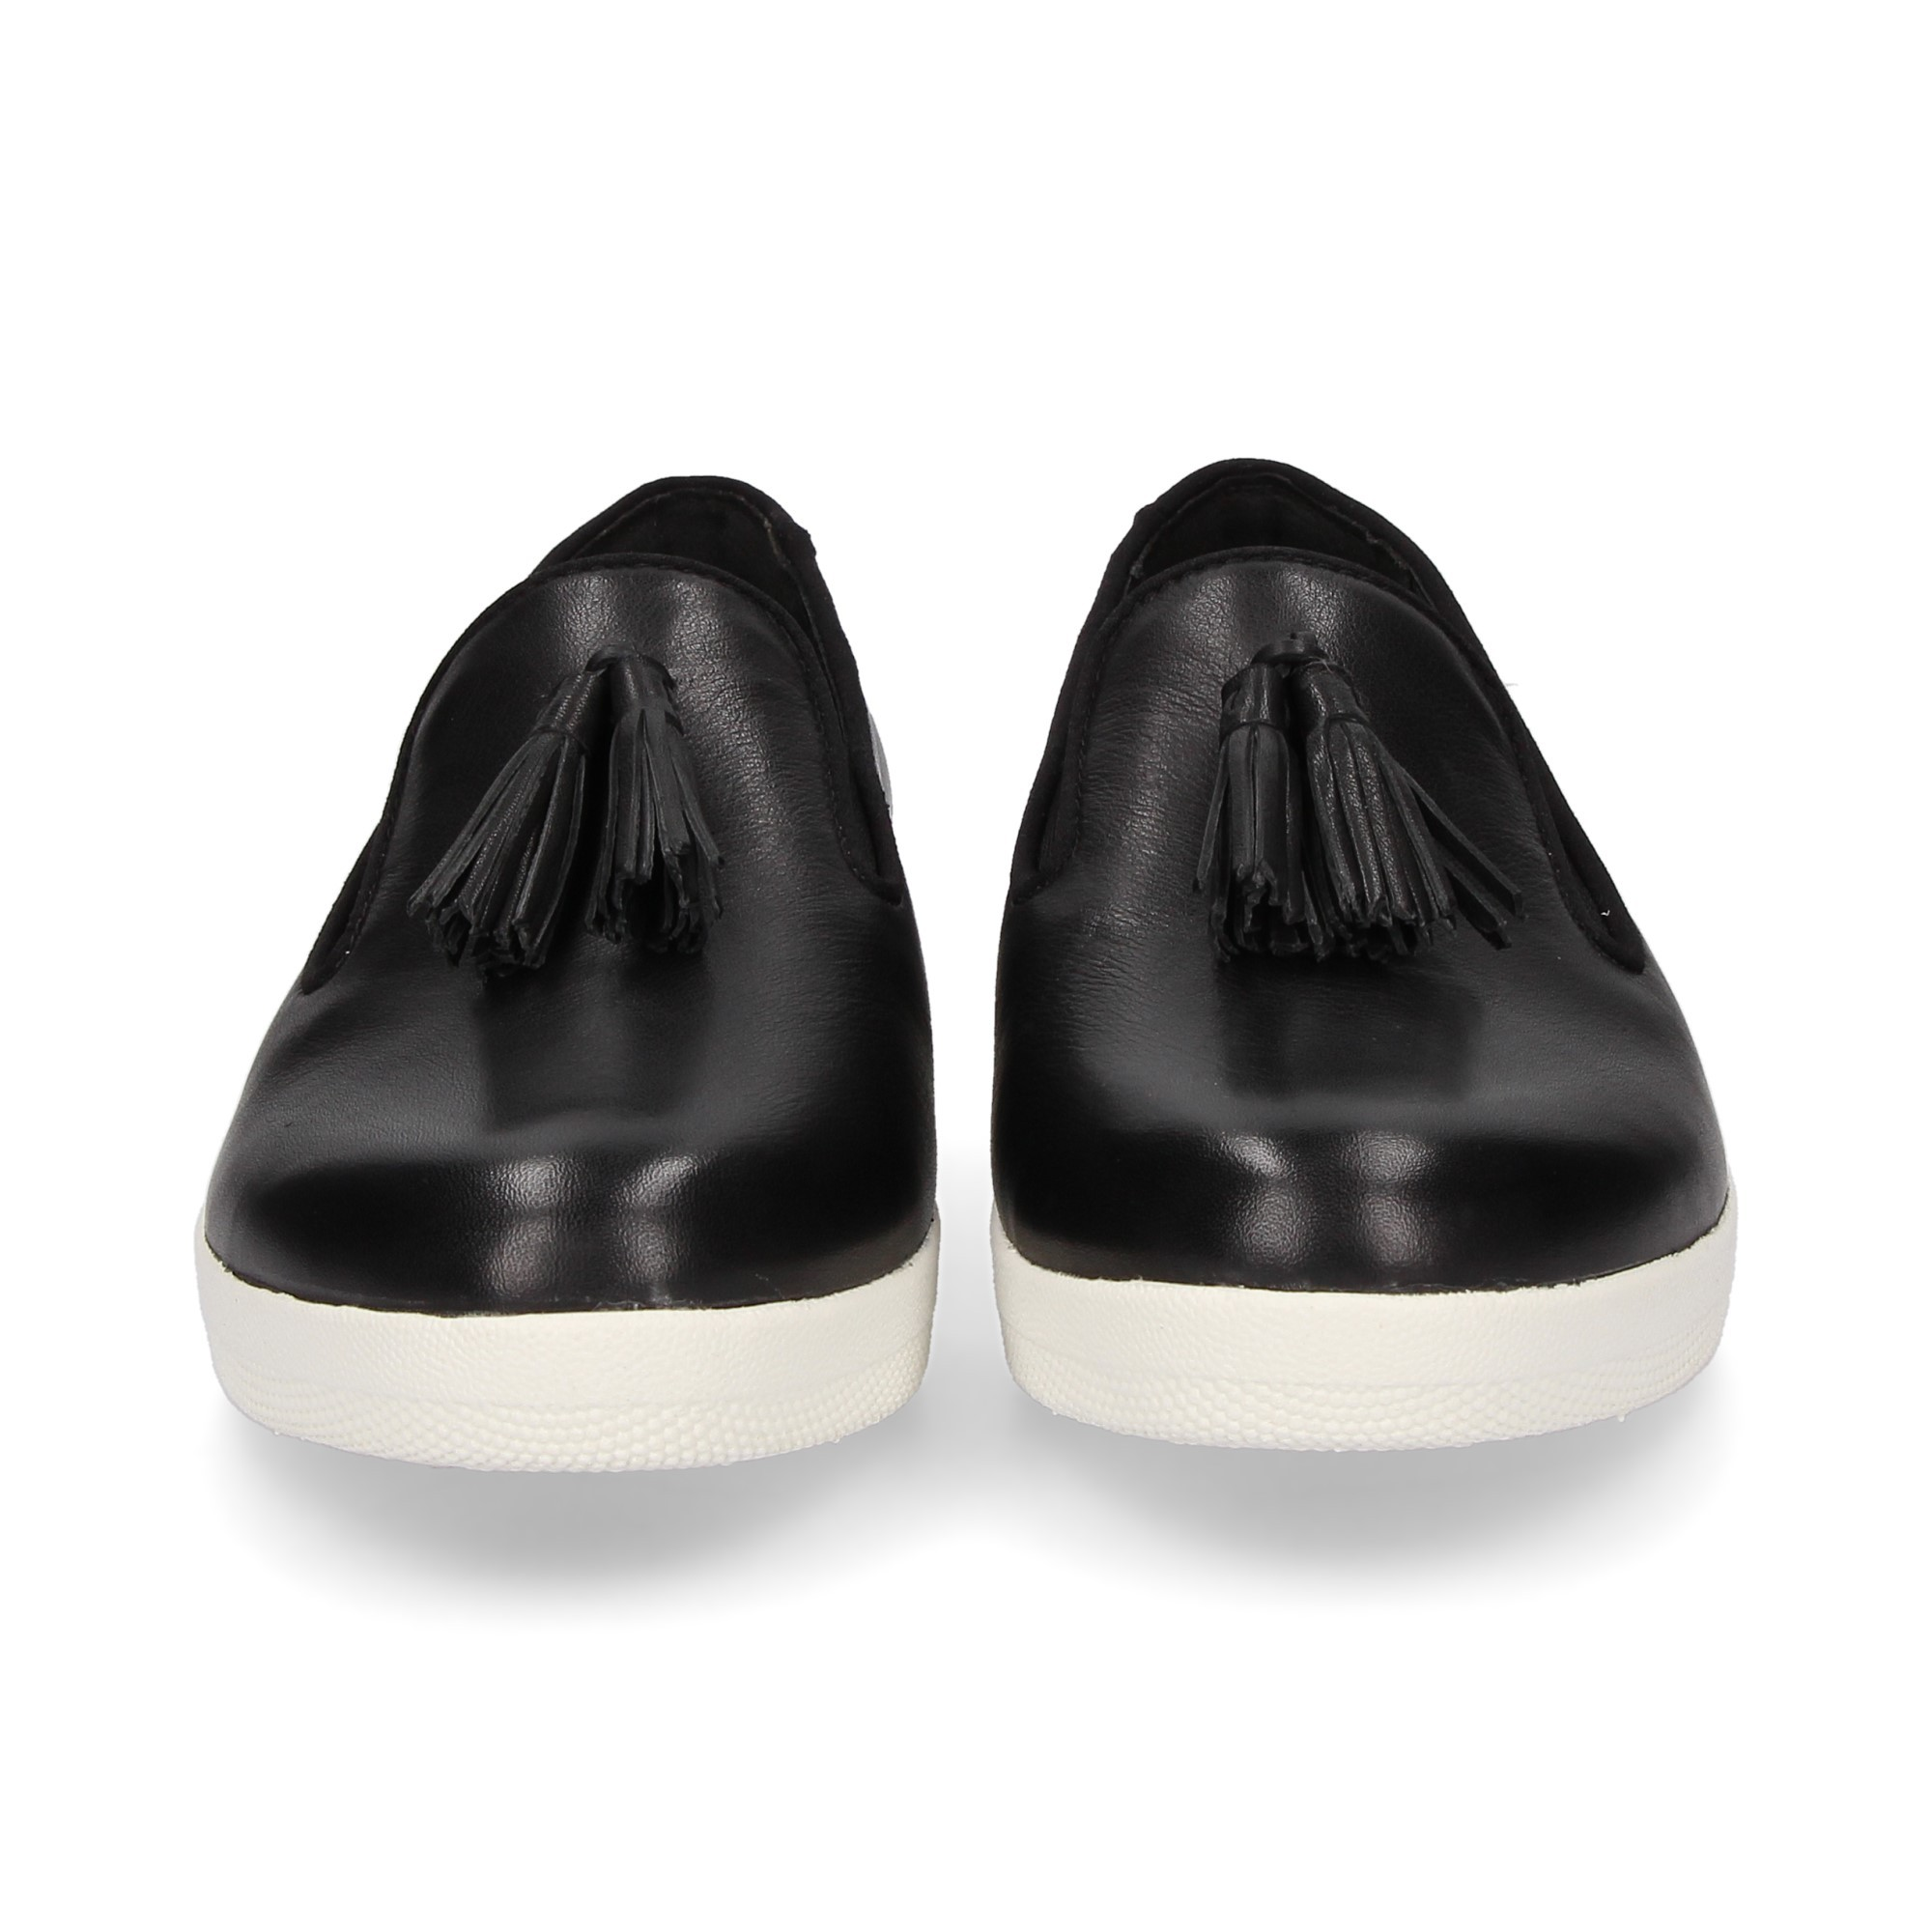 mocasin-plataforma-bollones-negro